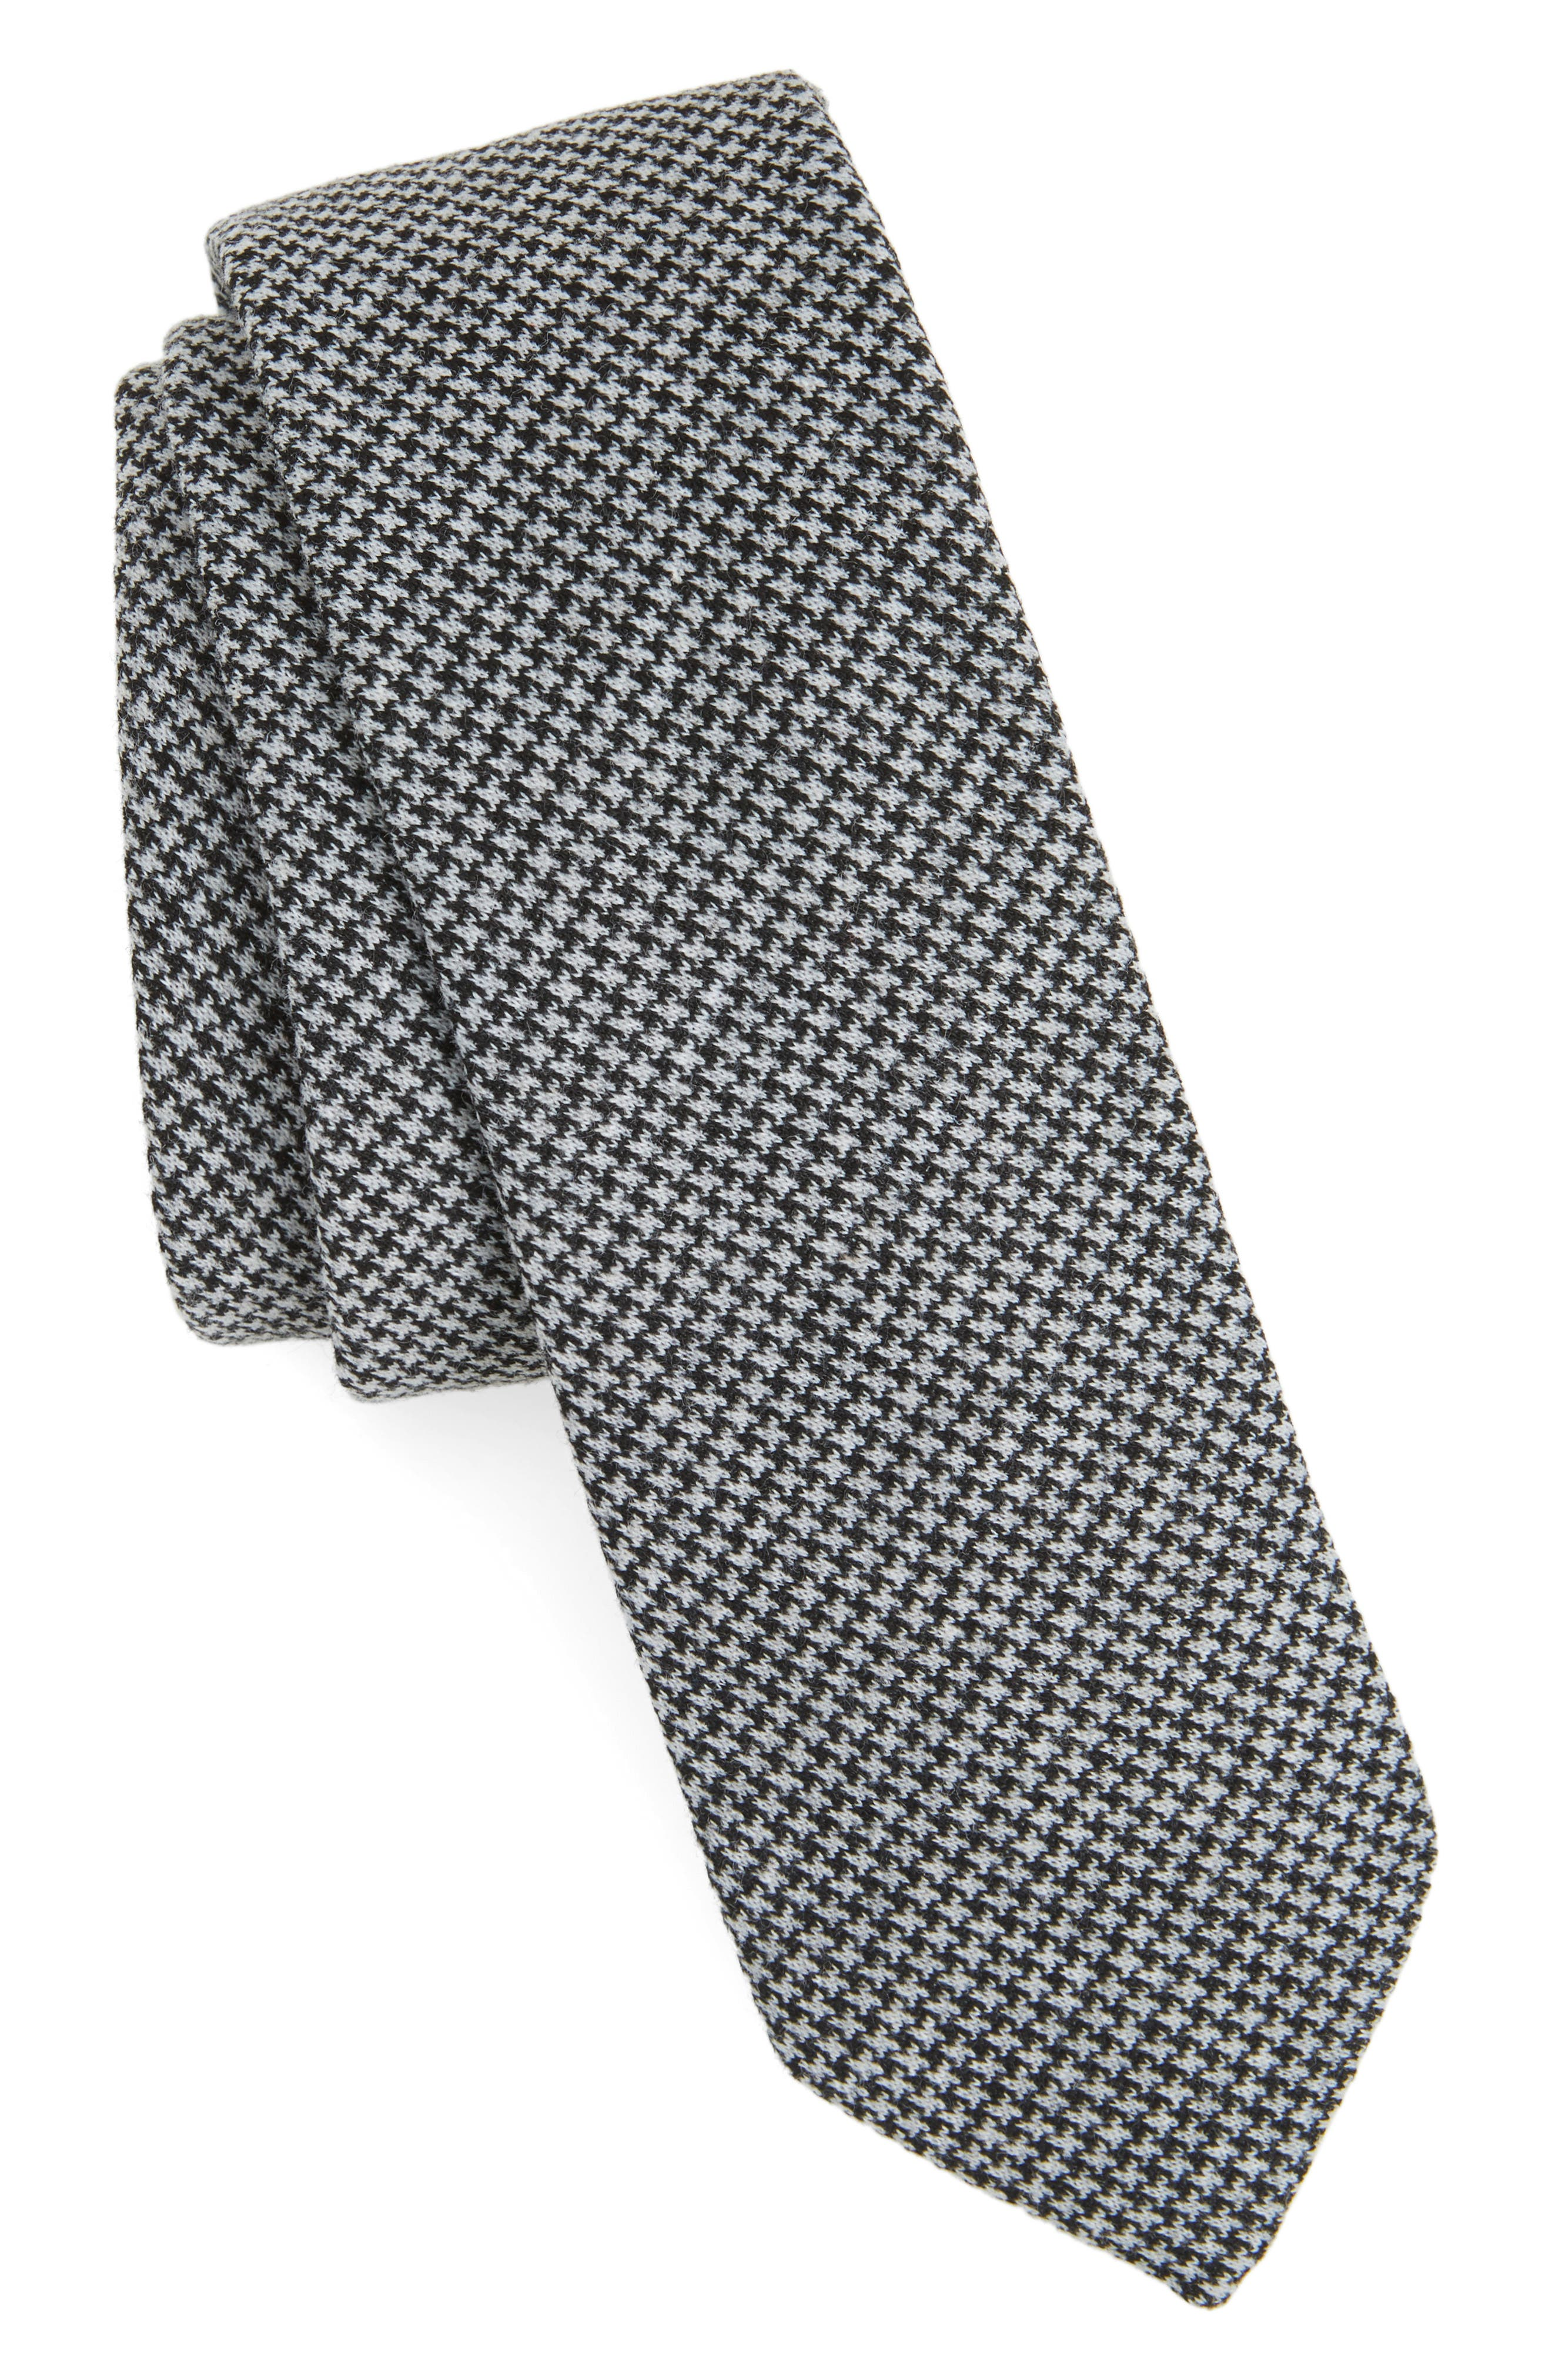 Walton Houndstooth Skinny Tie,                             Main thumbnail 1, color,                             Navy